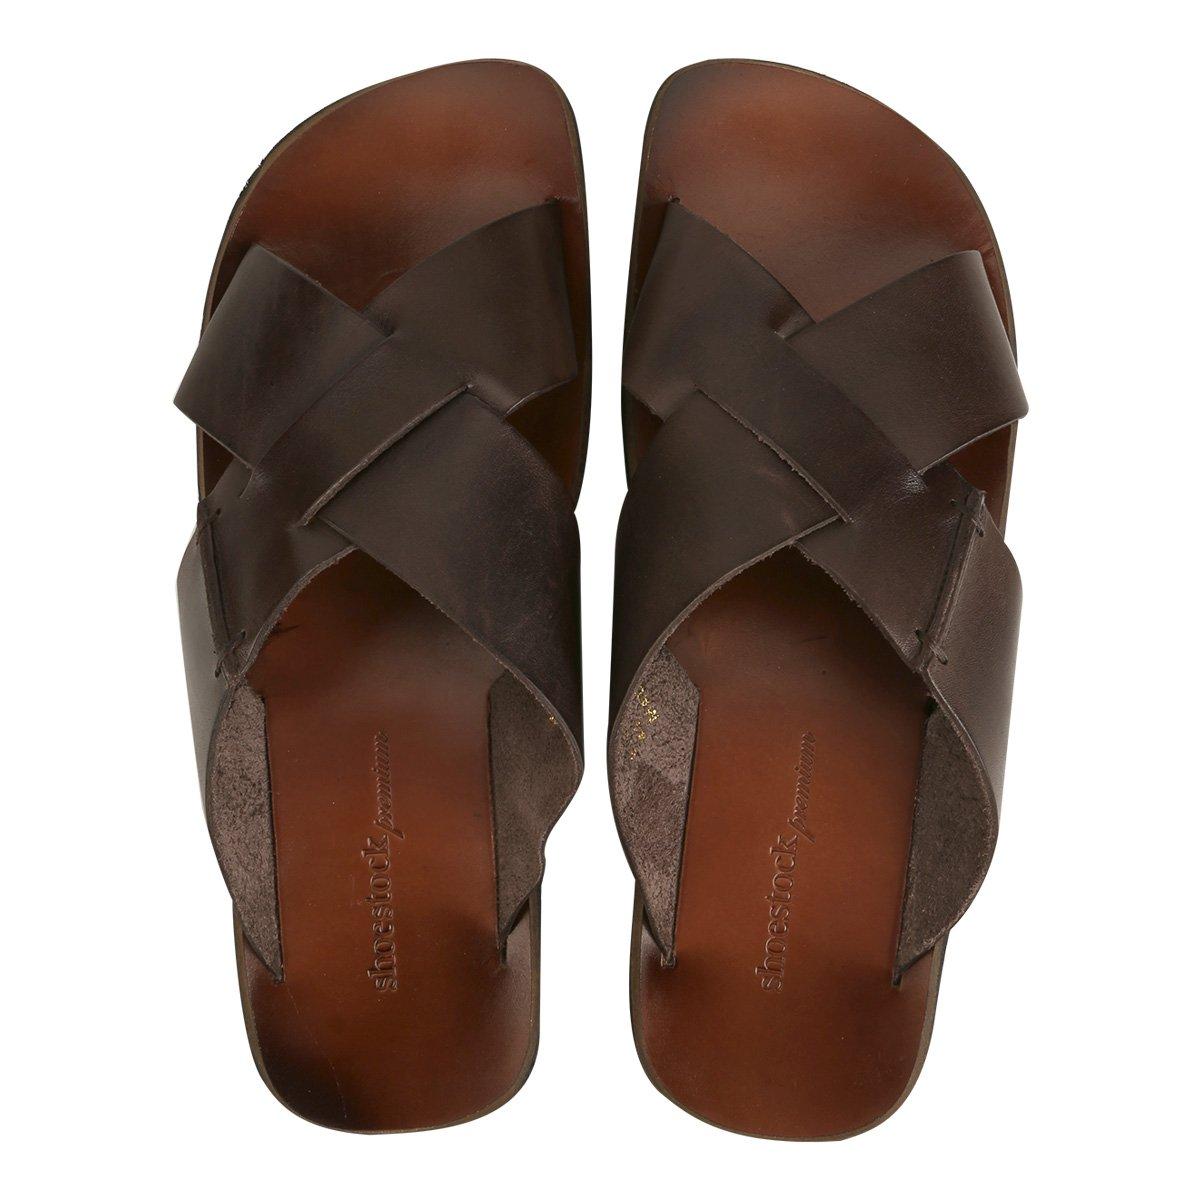 e85c4ccc6 Chinelo Couro Shoestock Tiras Cruzadas Masculino | Shoestock